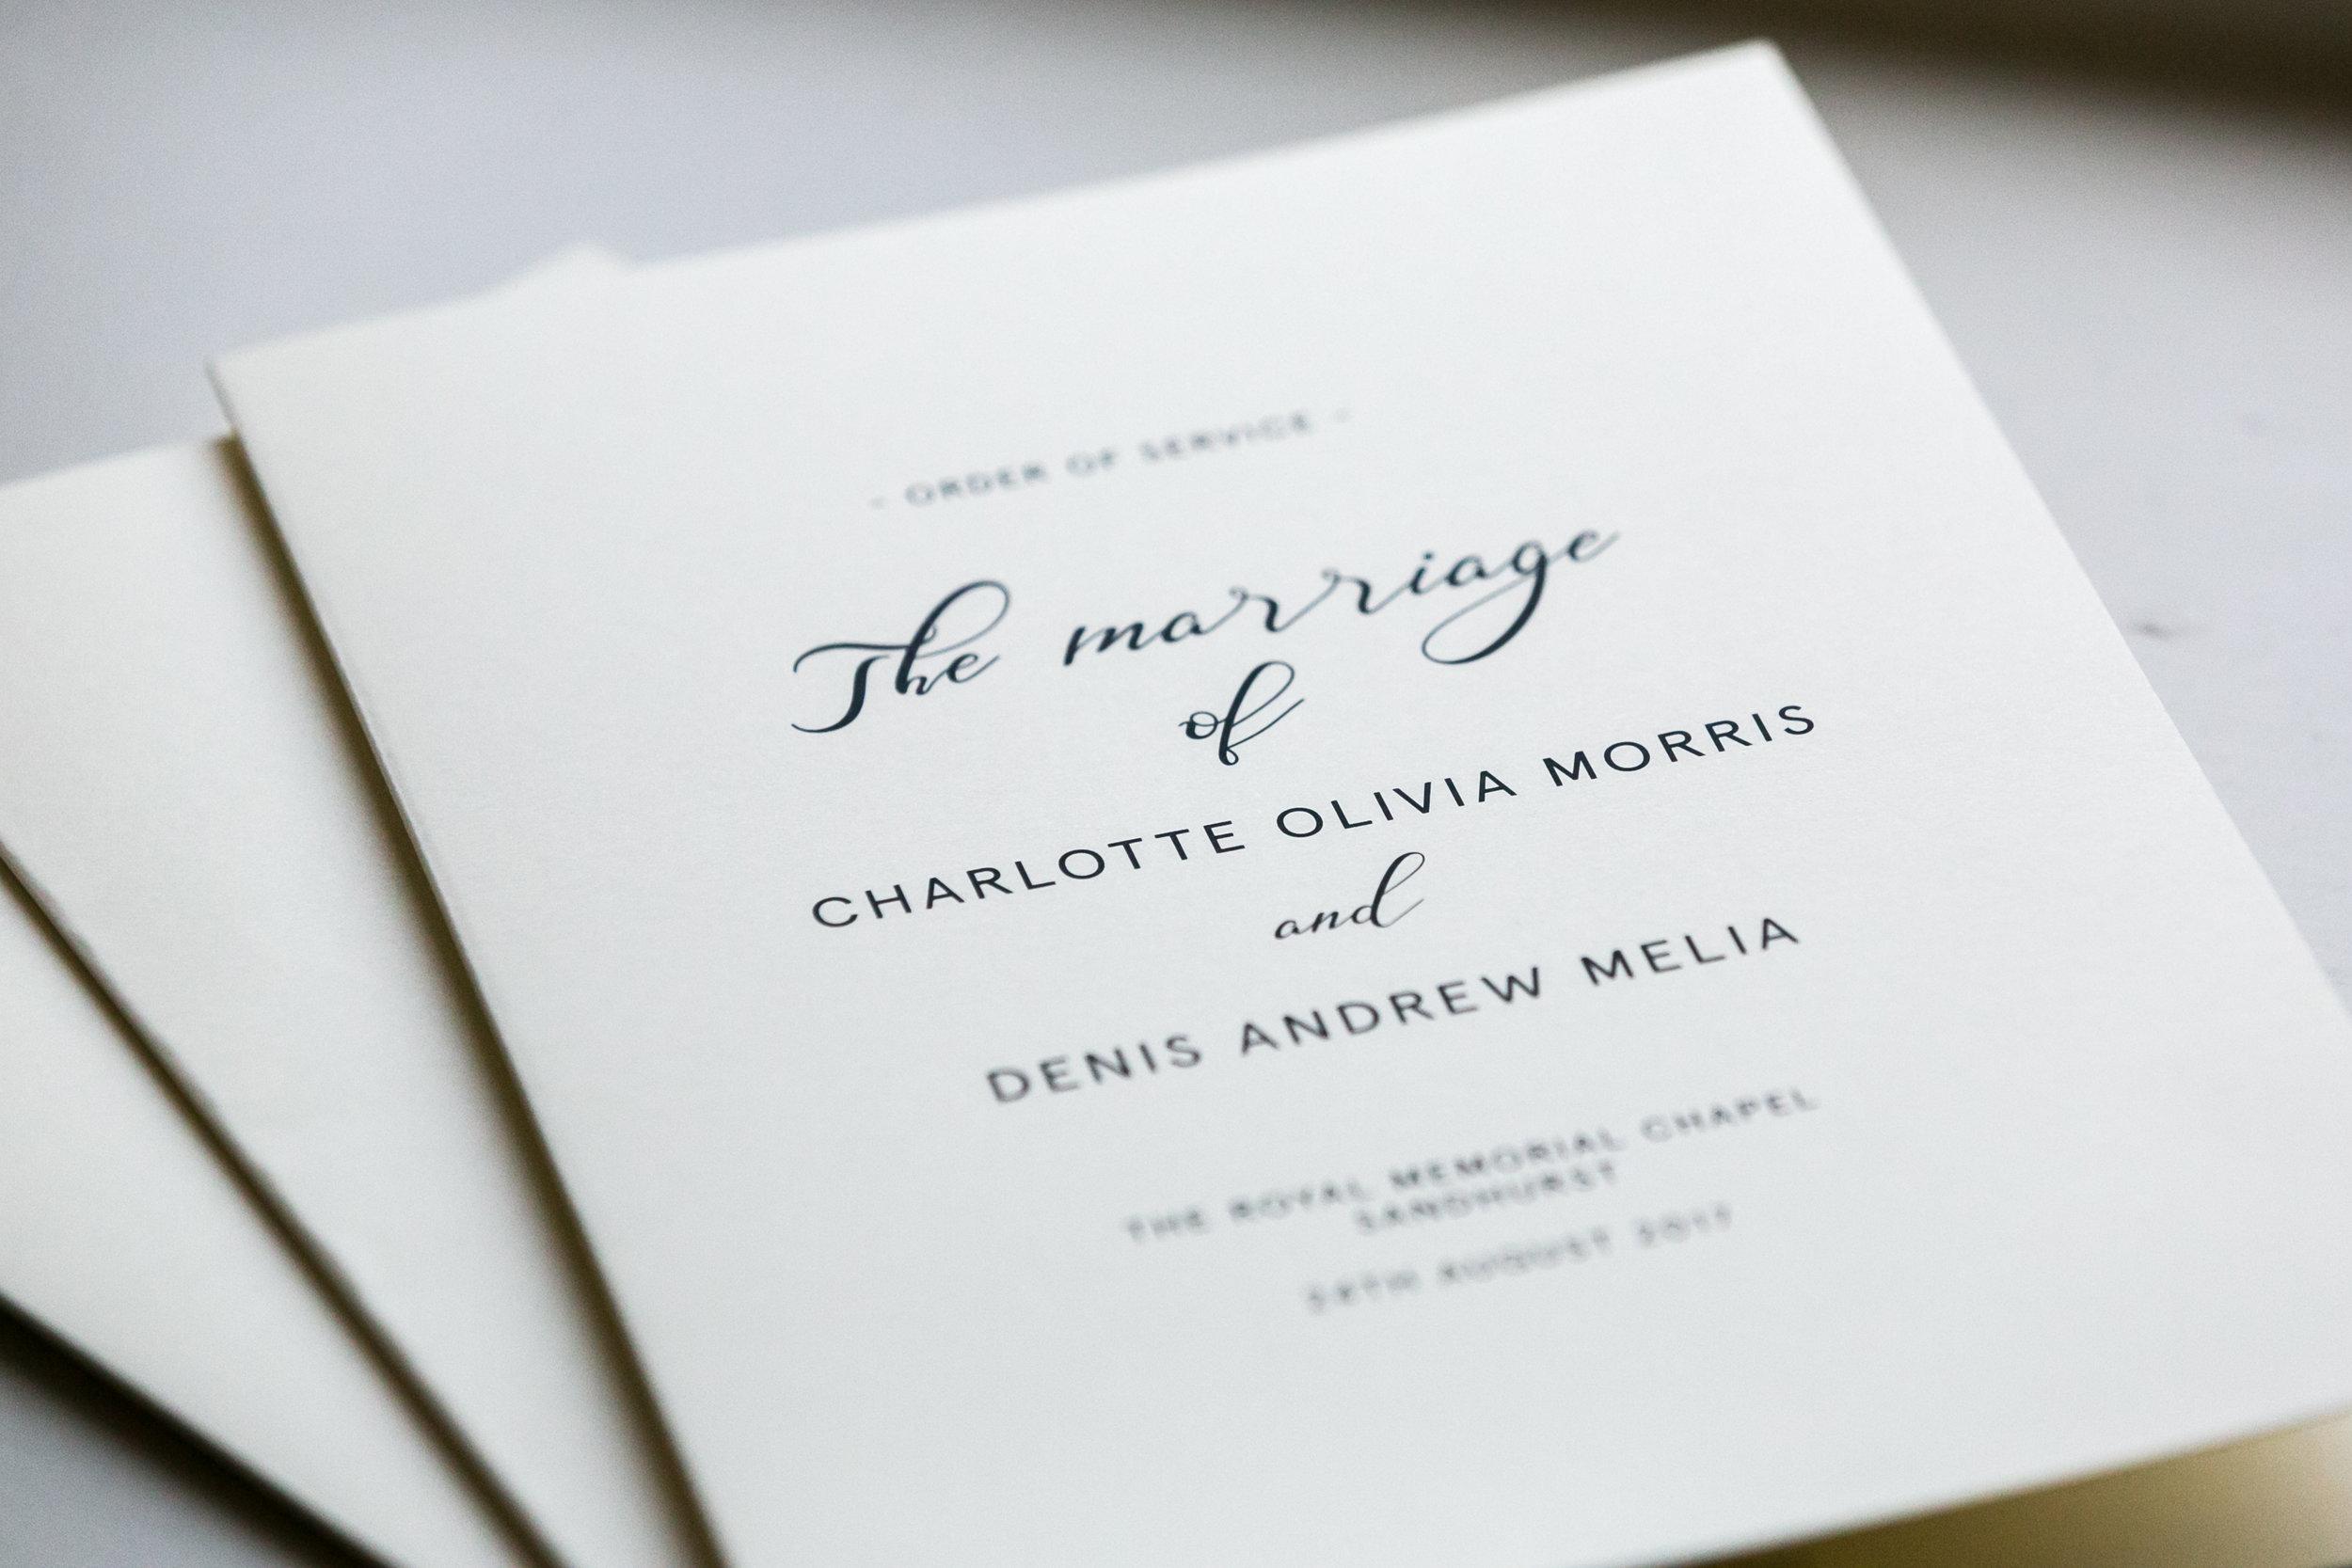 Charlotte-Denis-Wedding-Stationary-5.jpg